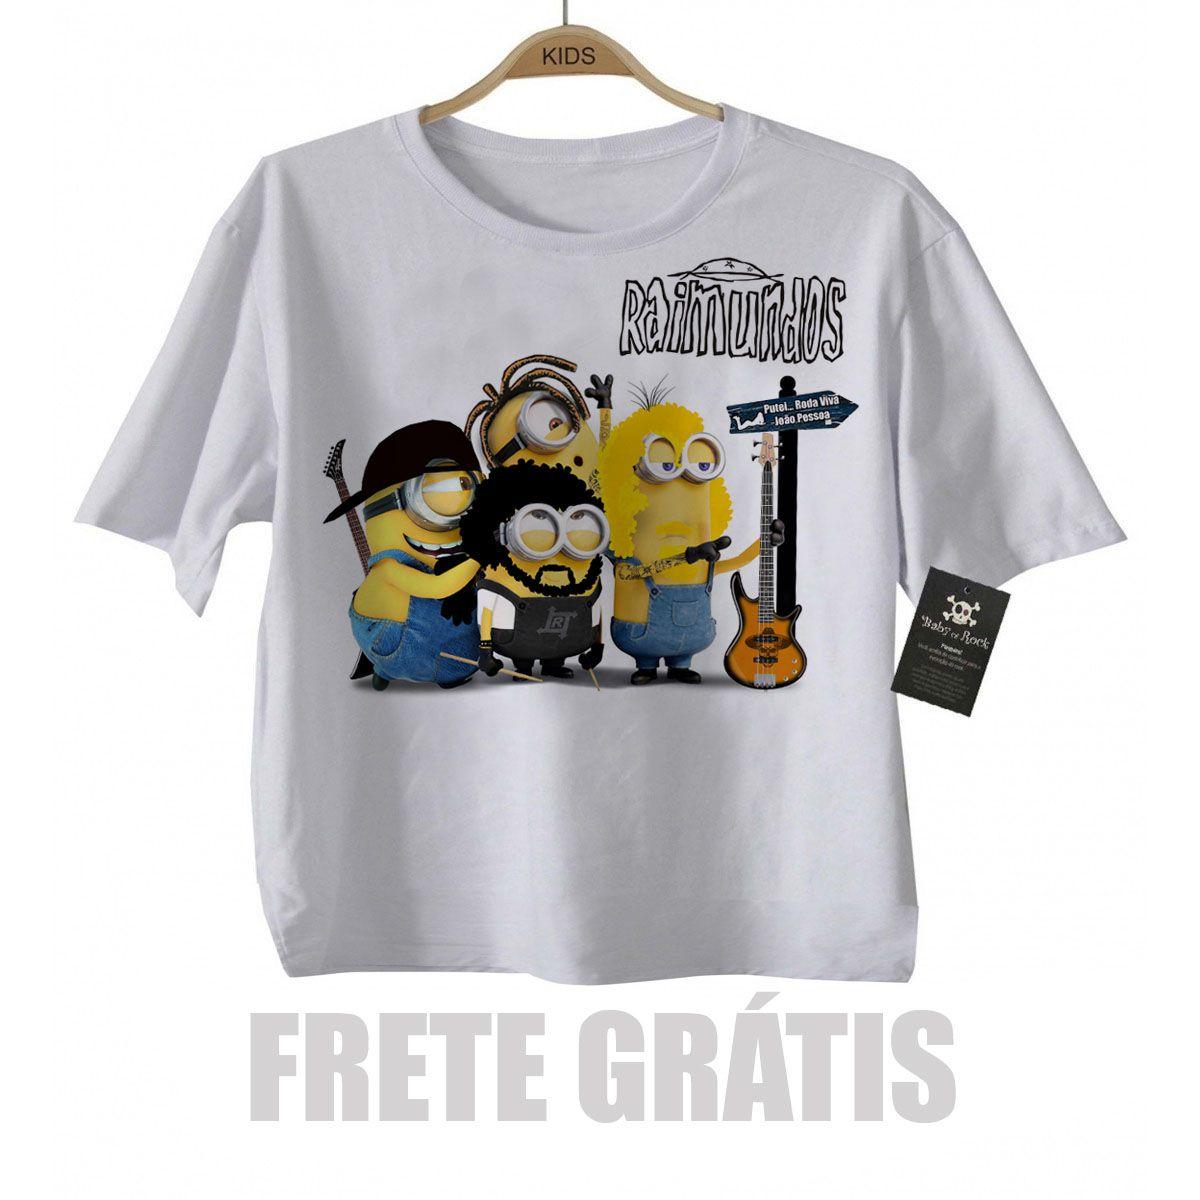 Camiseta Infantil de Rock Raimundos Minions Baby Monster  - Baby Monster S/A